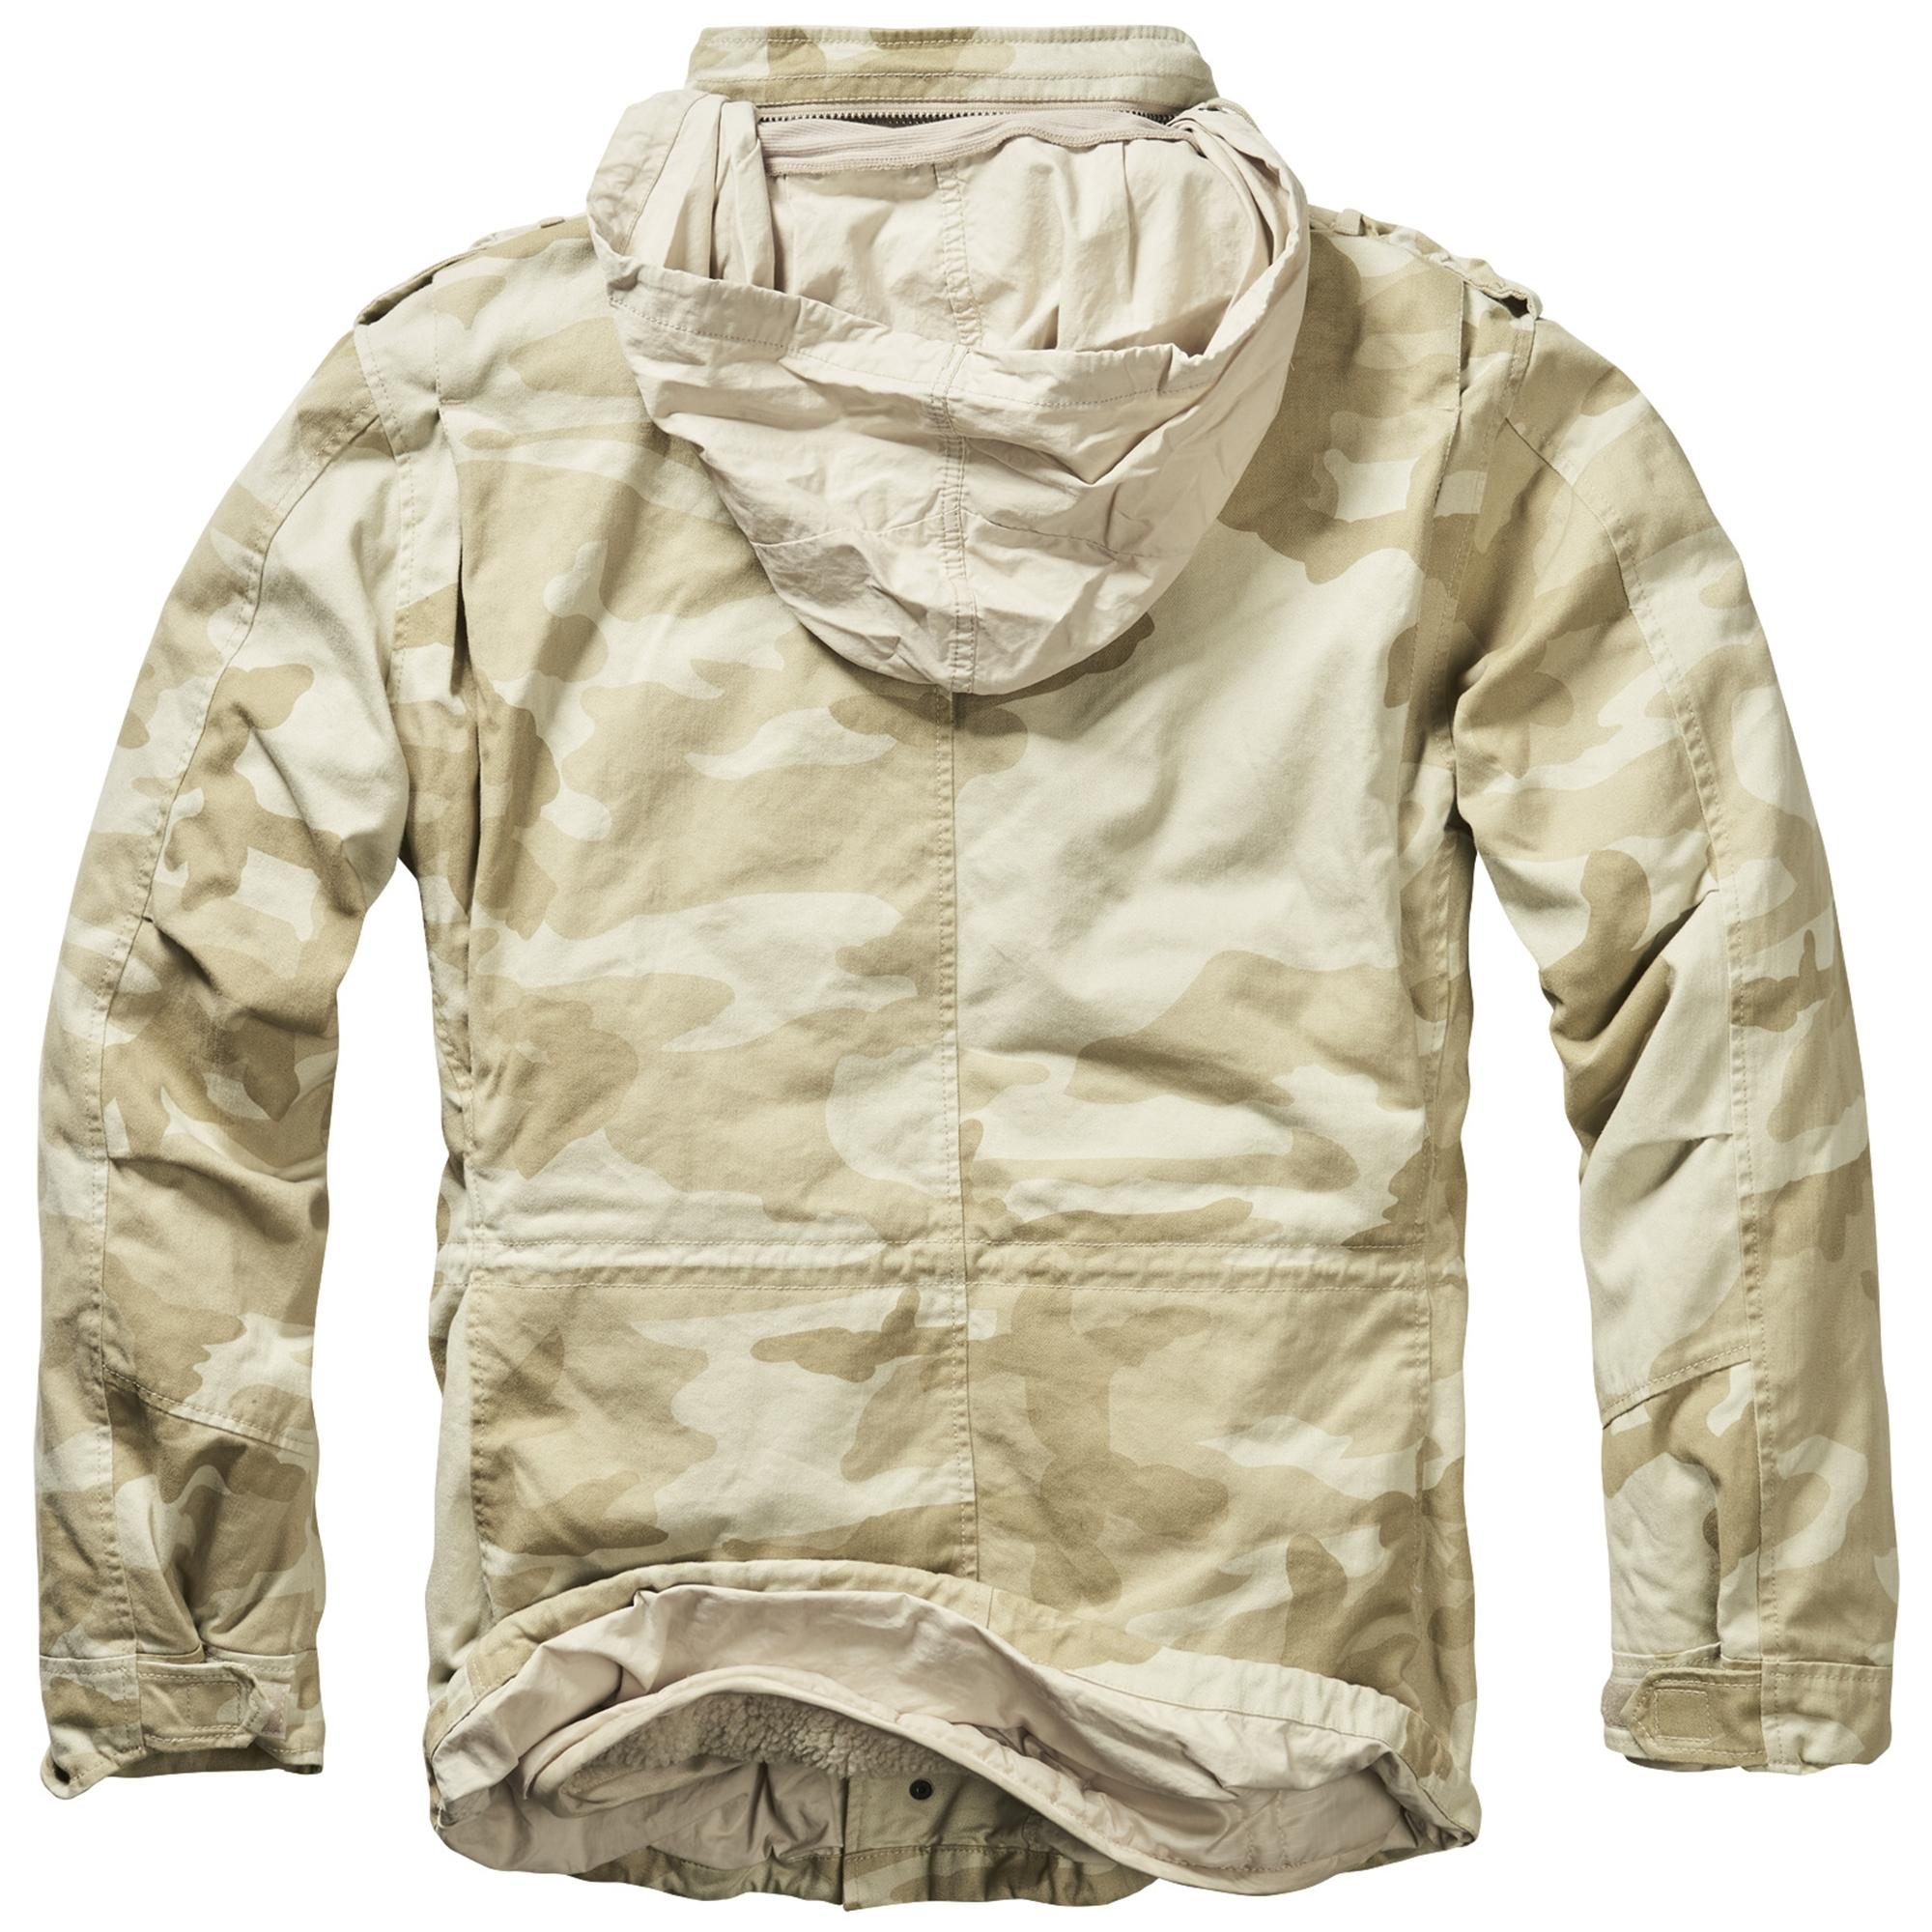 Brandit-M65-Giant-Herren-Jacke-Vintage-Feldjacke-Army-Outdoor-Parka-Futter-S-7XL Indexbild 23